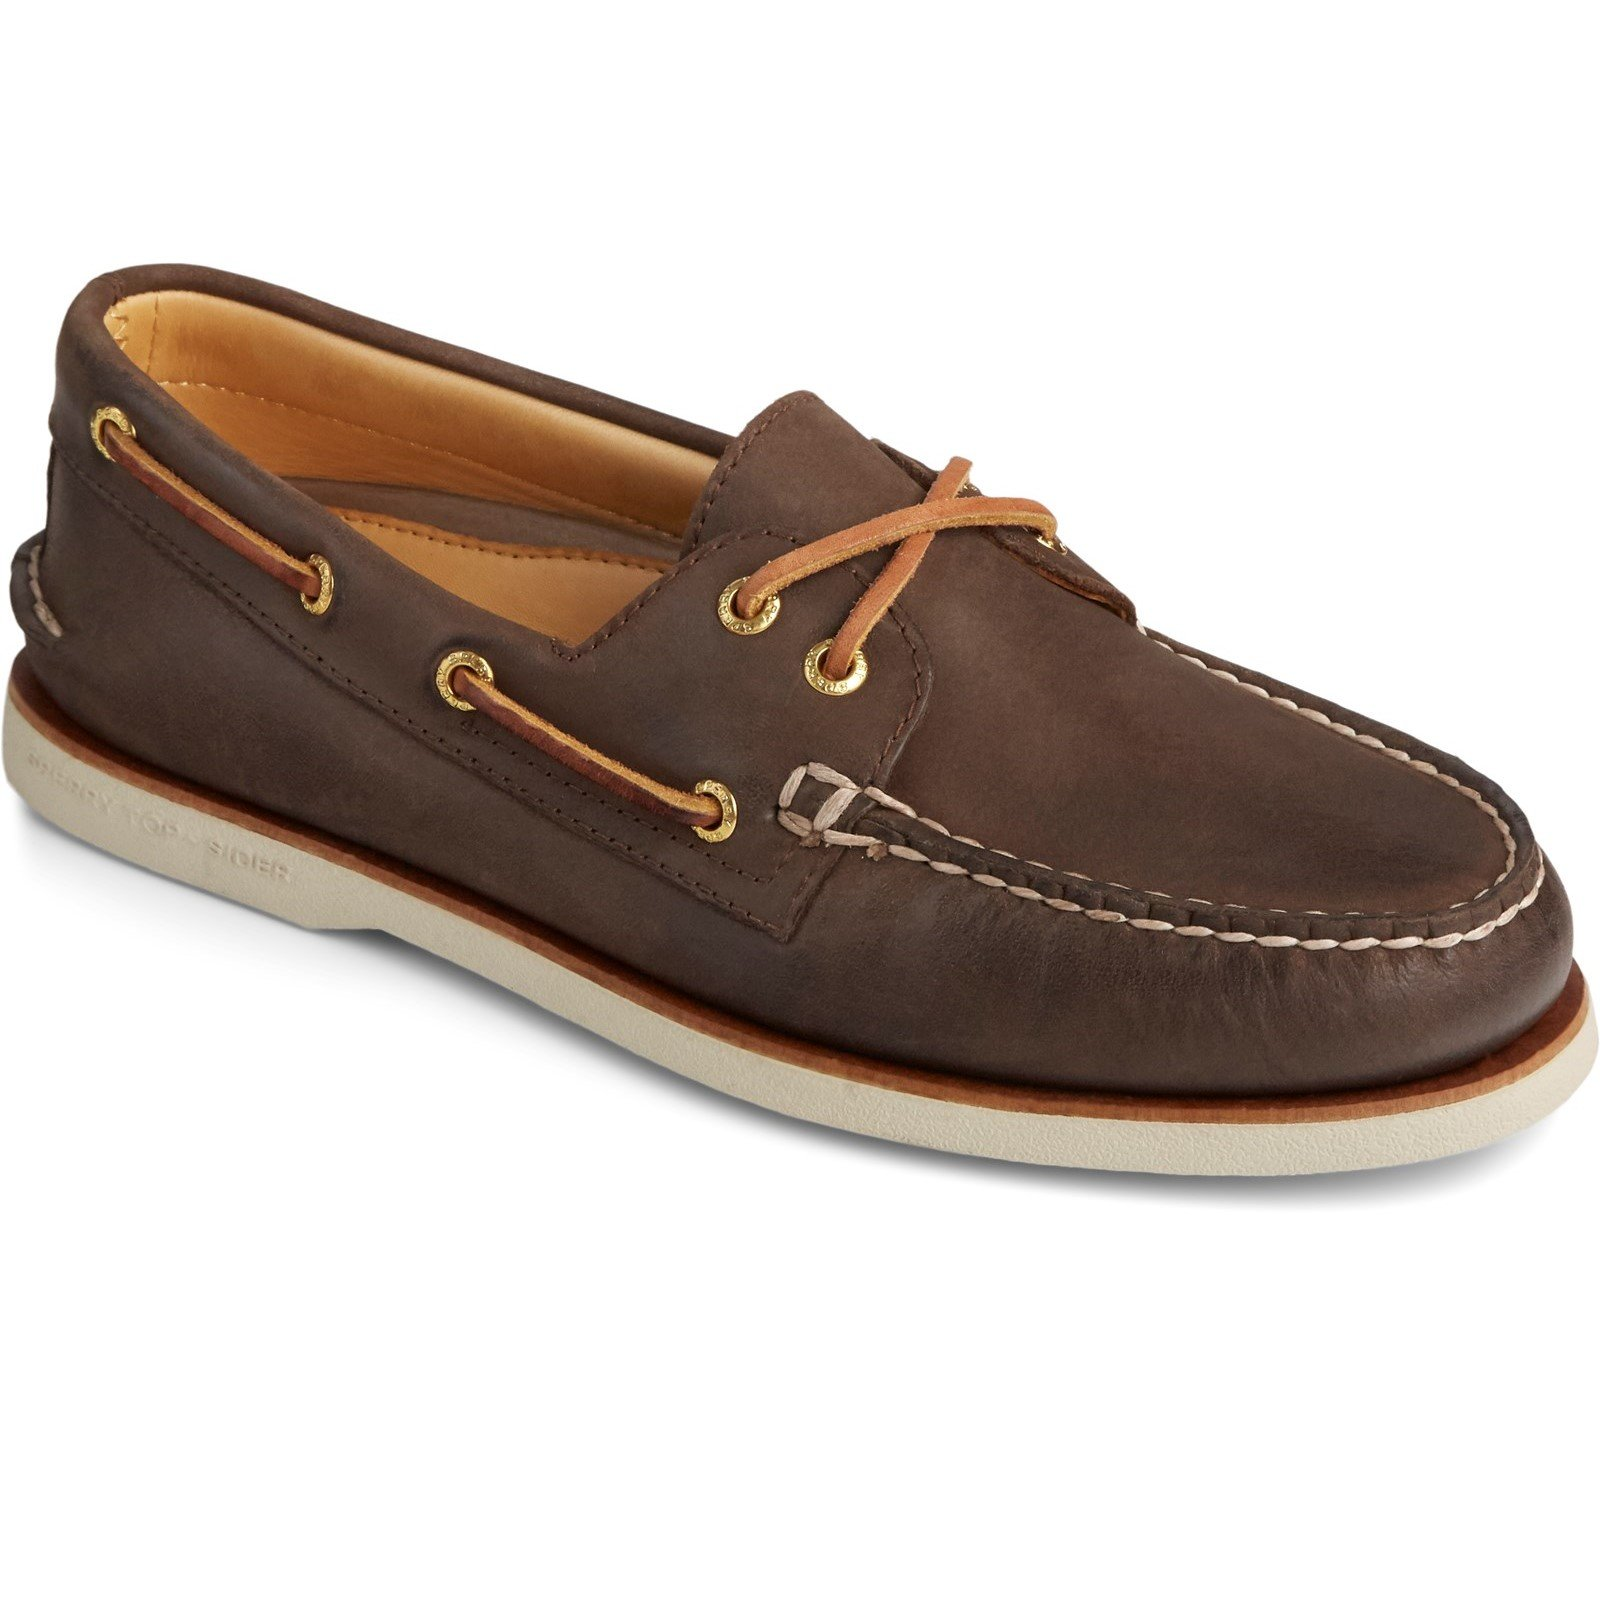 Sperry Men's Cup Authentic Original Boat Shoe Various Colours 31735 - Brown 9